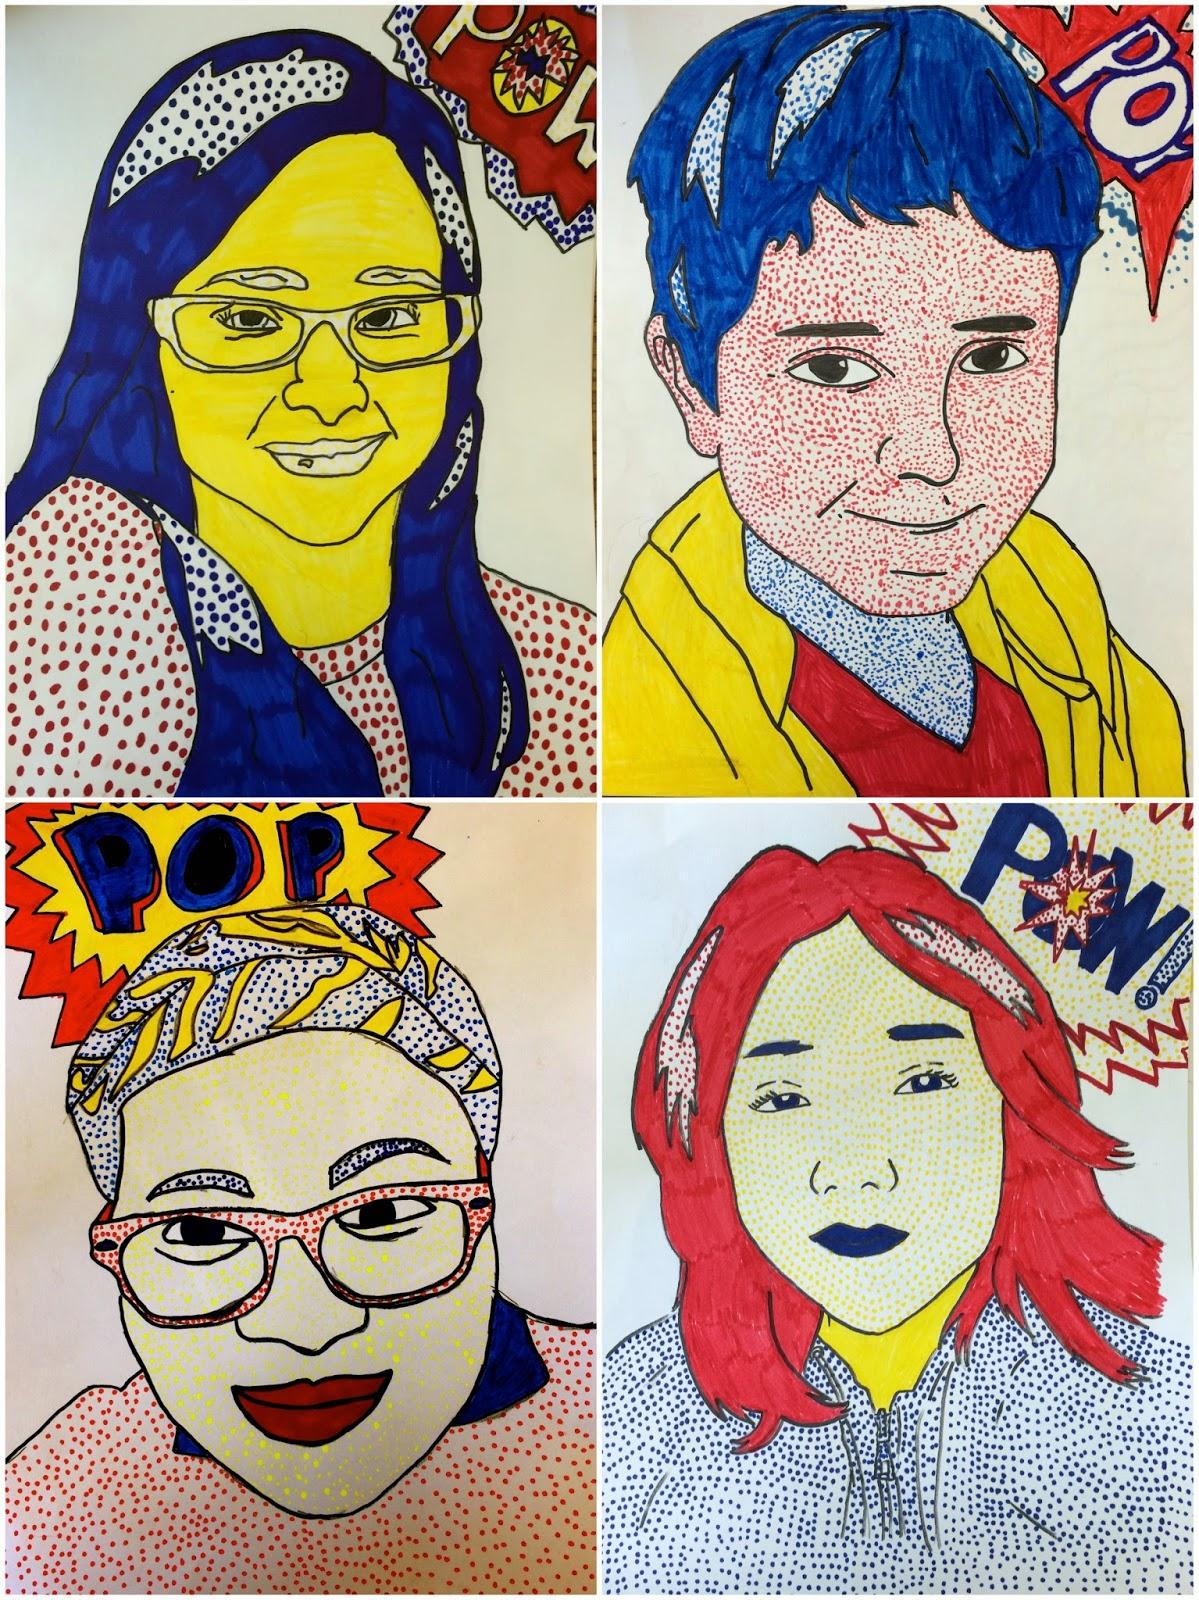 art eat tie dye repeat 6th grade roy lichtenstein self portraits. Black Bedroom Furniture Sets. Home Design Ideas